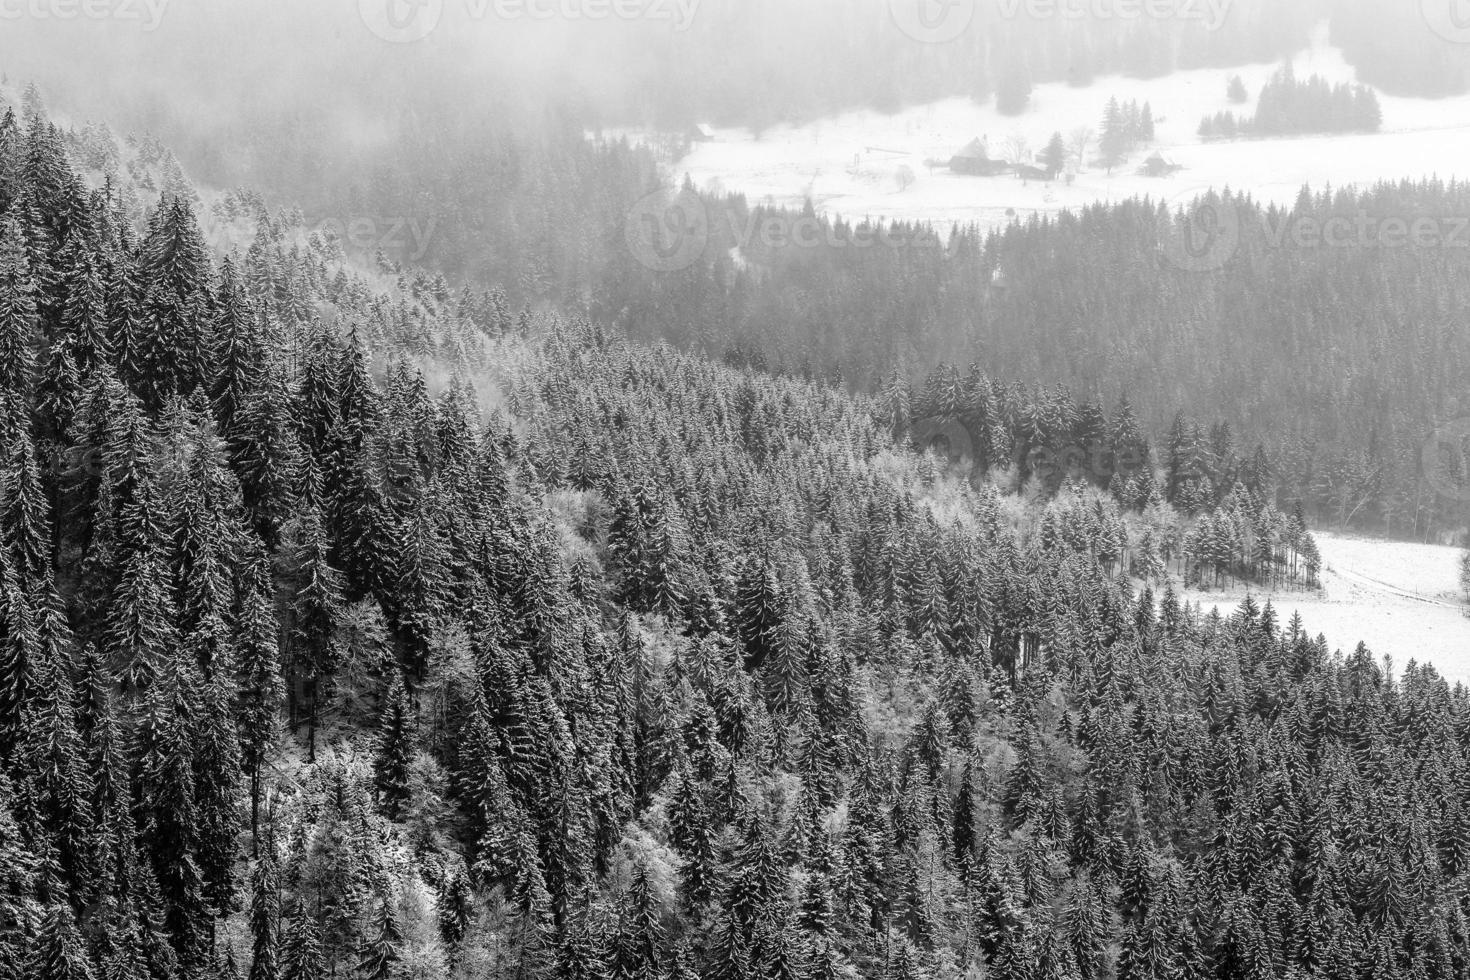 Winter Black Forest photo